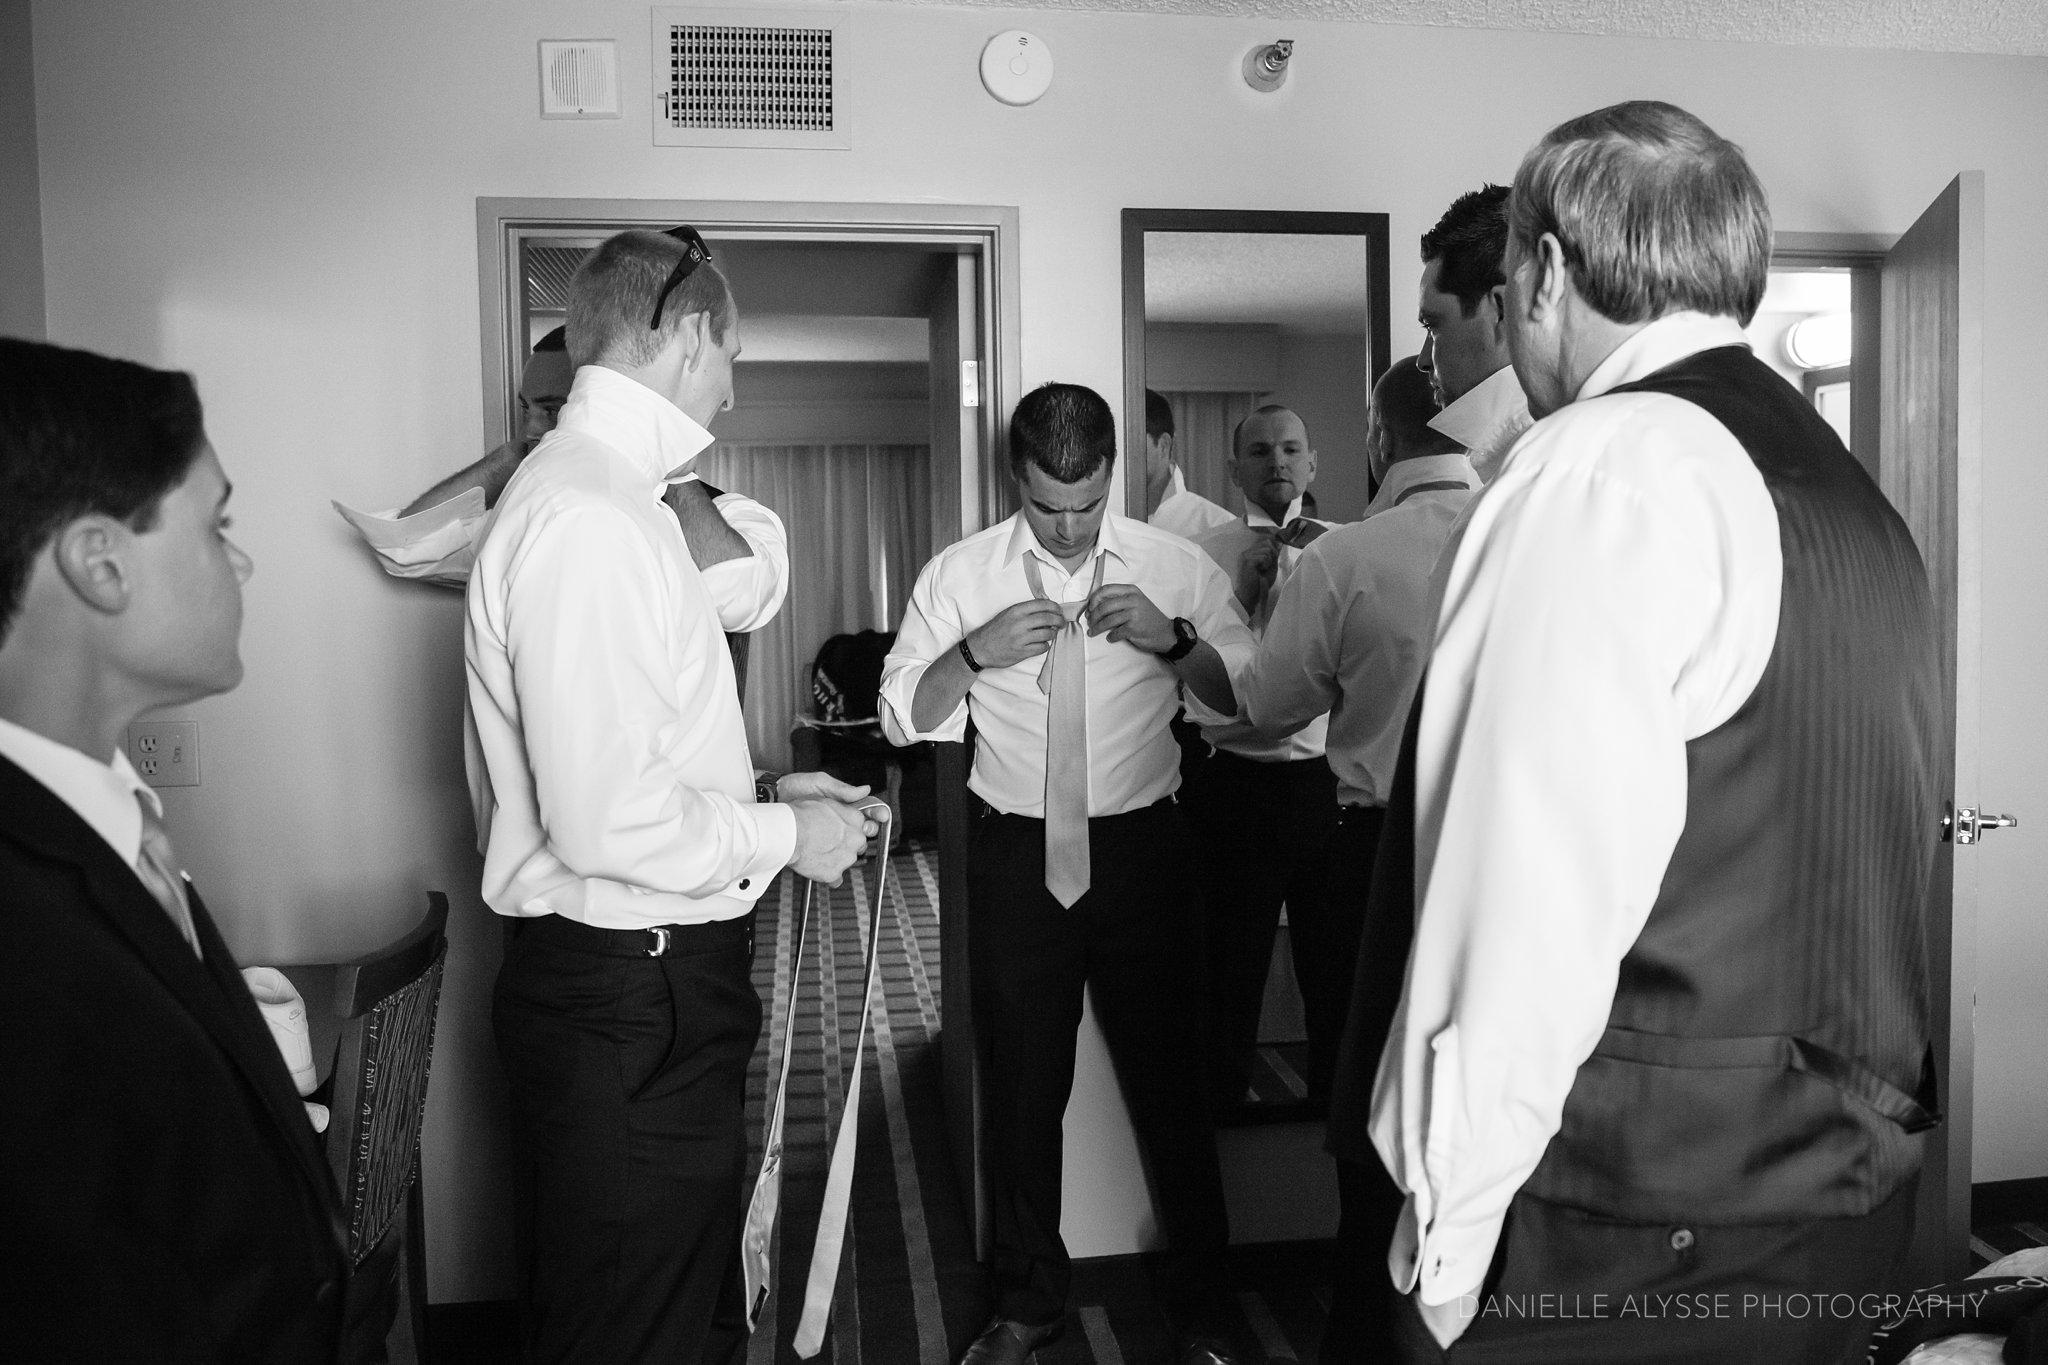 170429_blog_kimberly_ben_wedding_san_mateo_curiodyssey_danielle_alysse_photography_sacramento_photographer0076_WEB.jpg